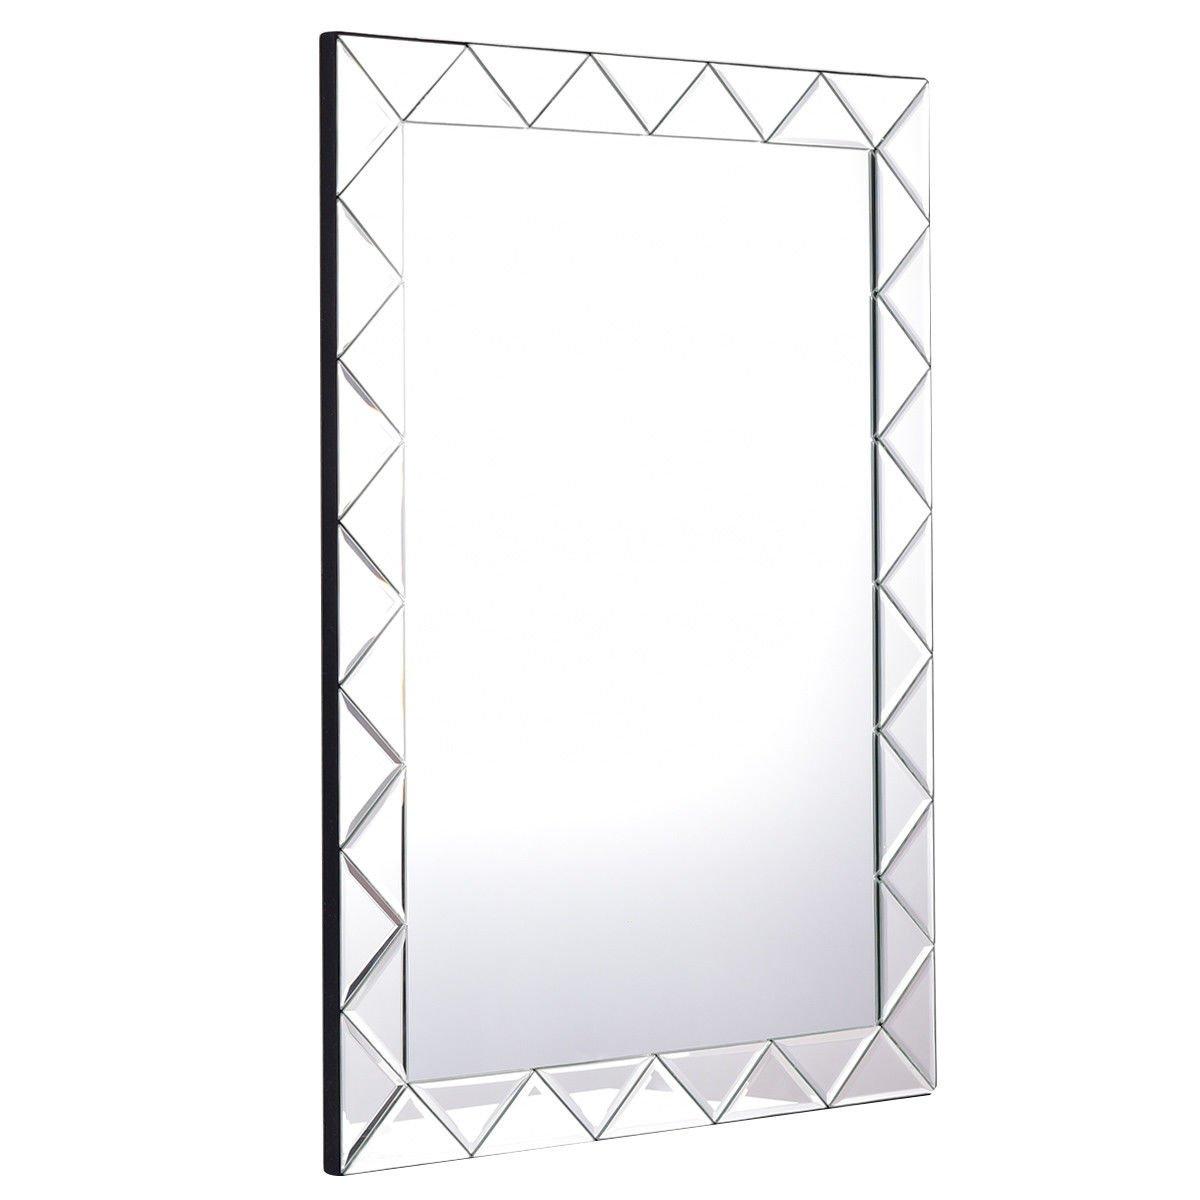 TANGKULA 21.5'' x 30.5'' Wall Mirror Beveled Mirror Rectangle Bathroom Home Decor Mirror